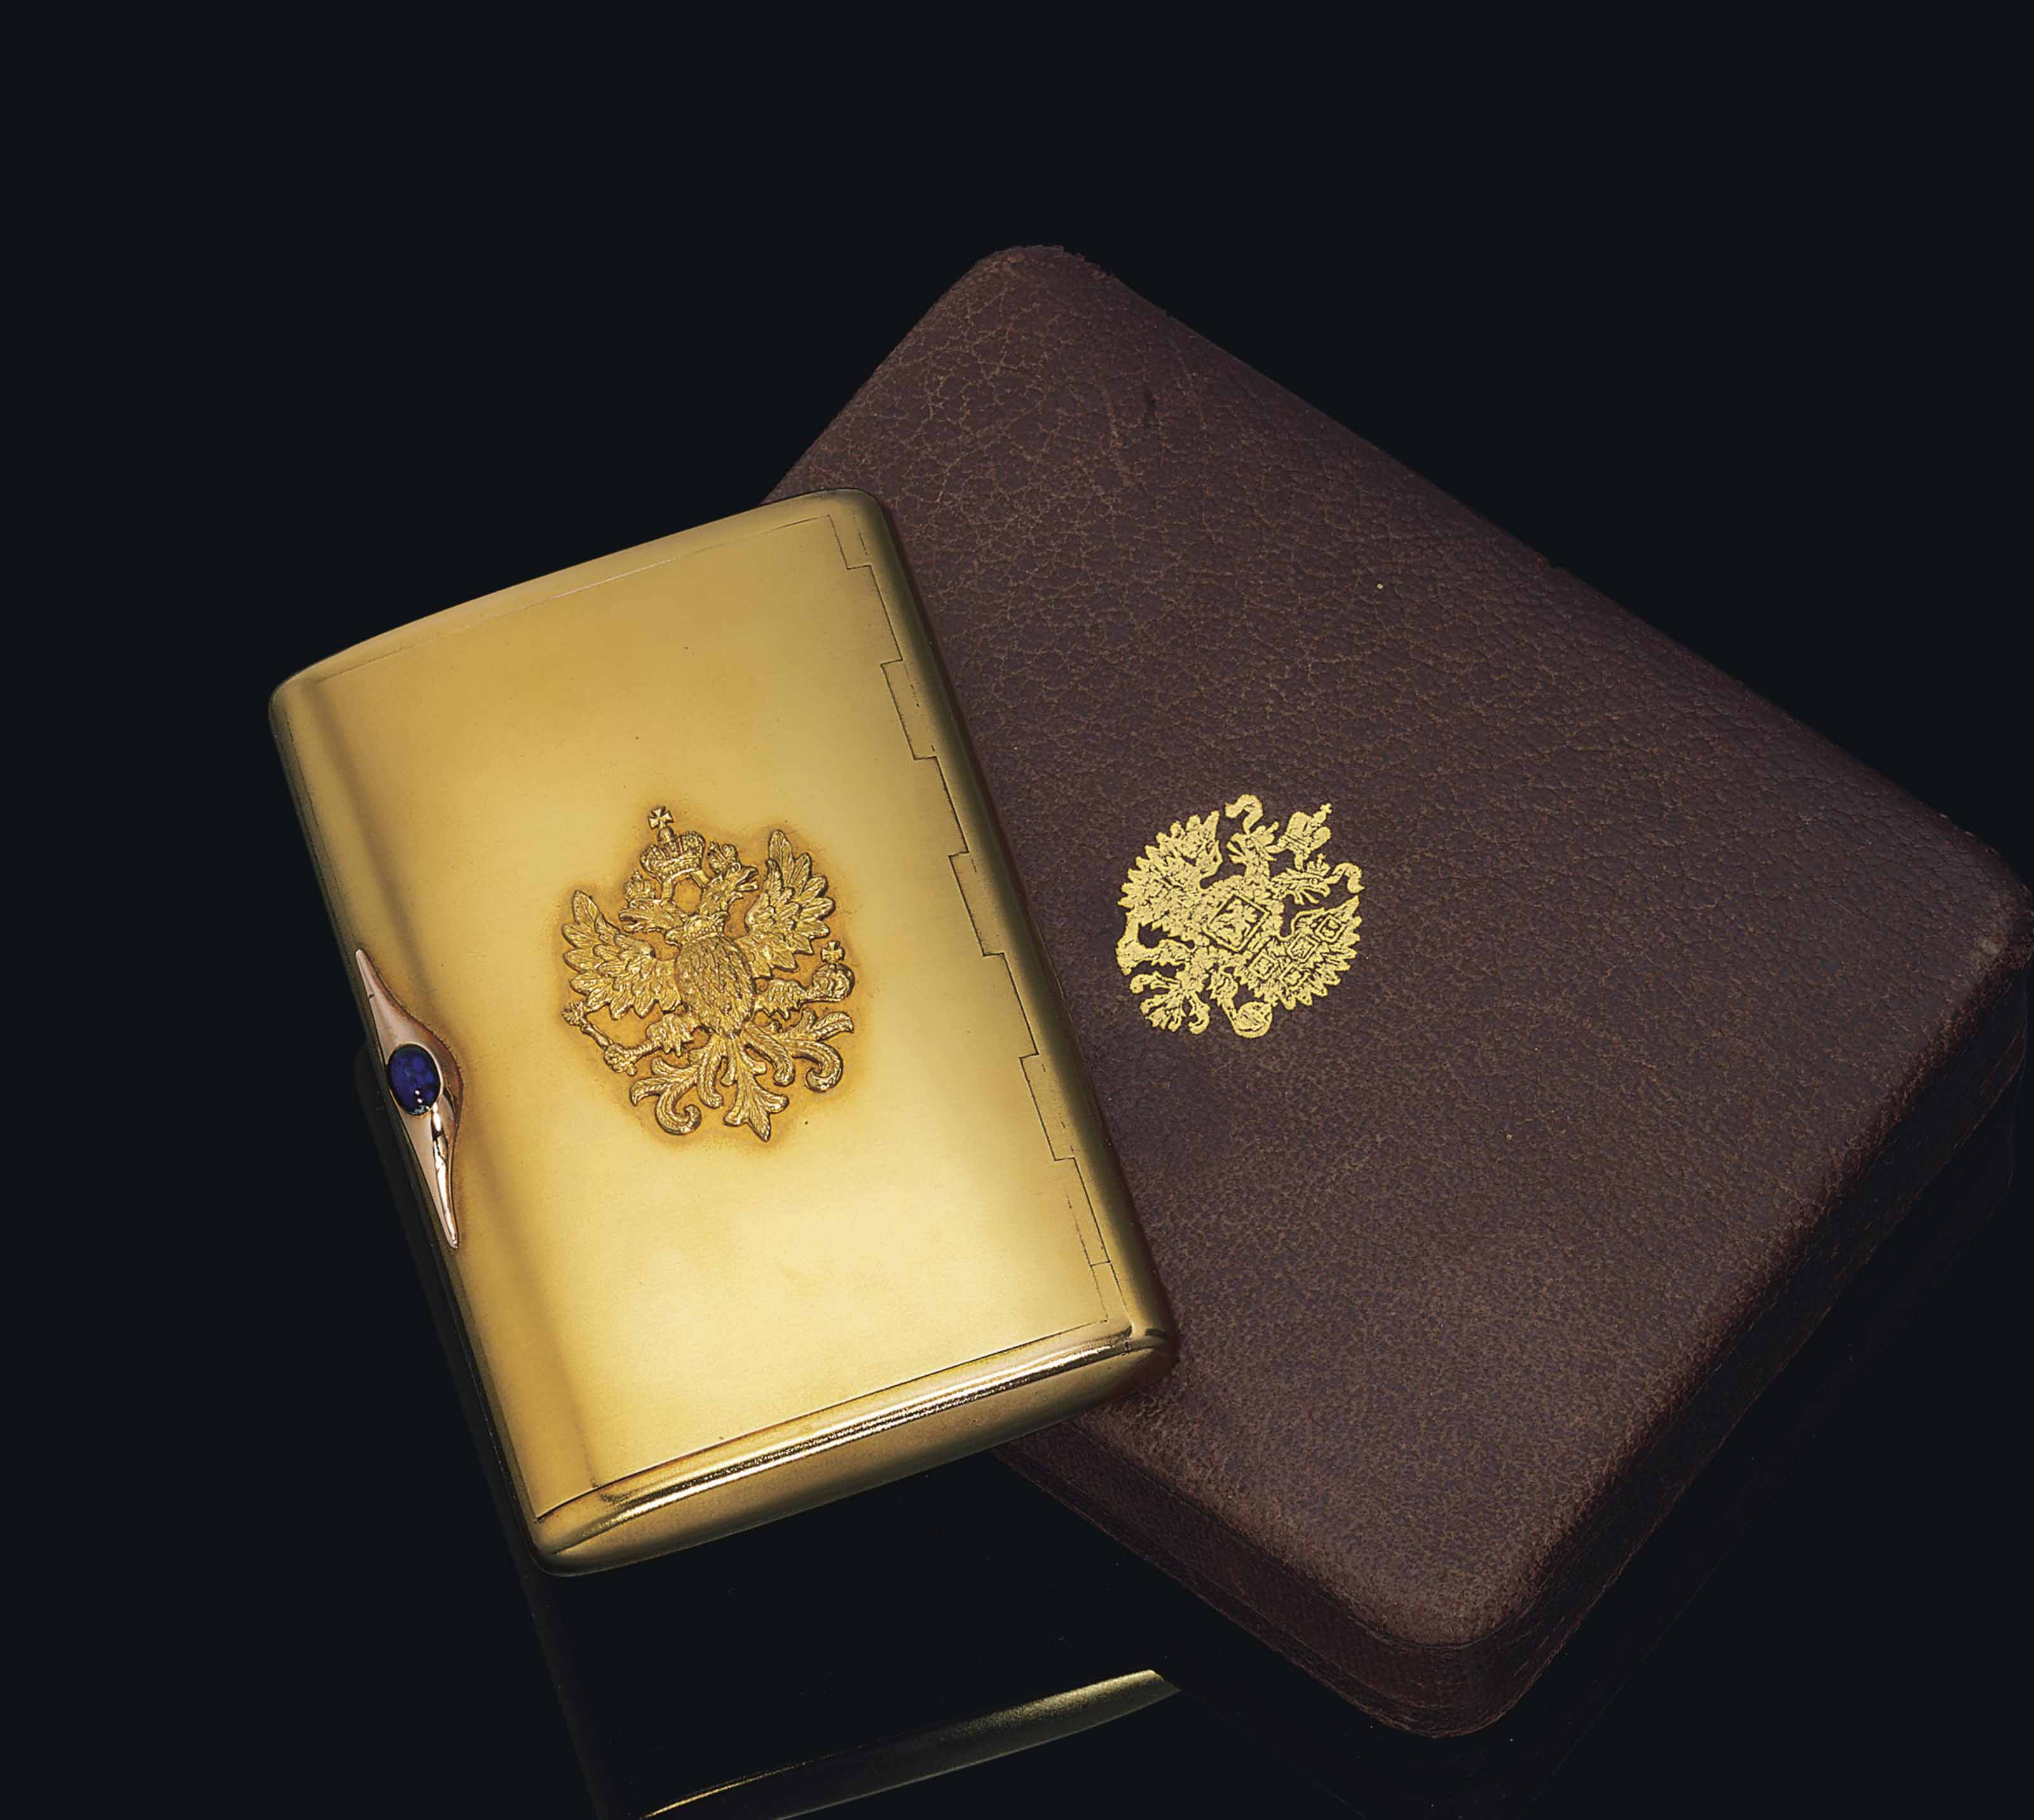 A JEWELLED TWO-COLOUR GOLD PRESENTATION CIGARETTE CASE